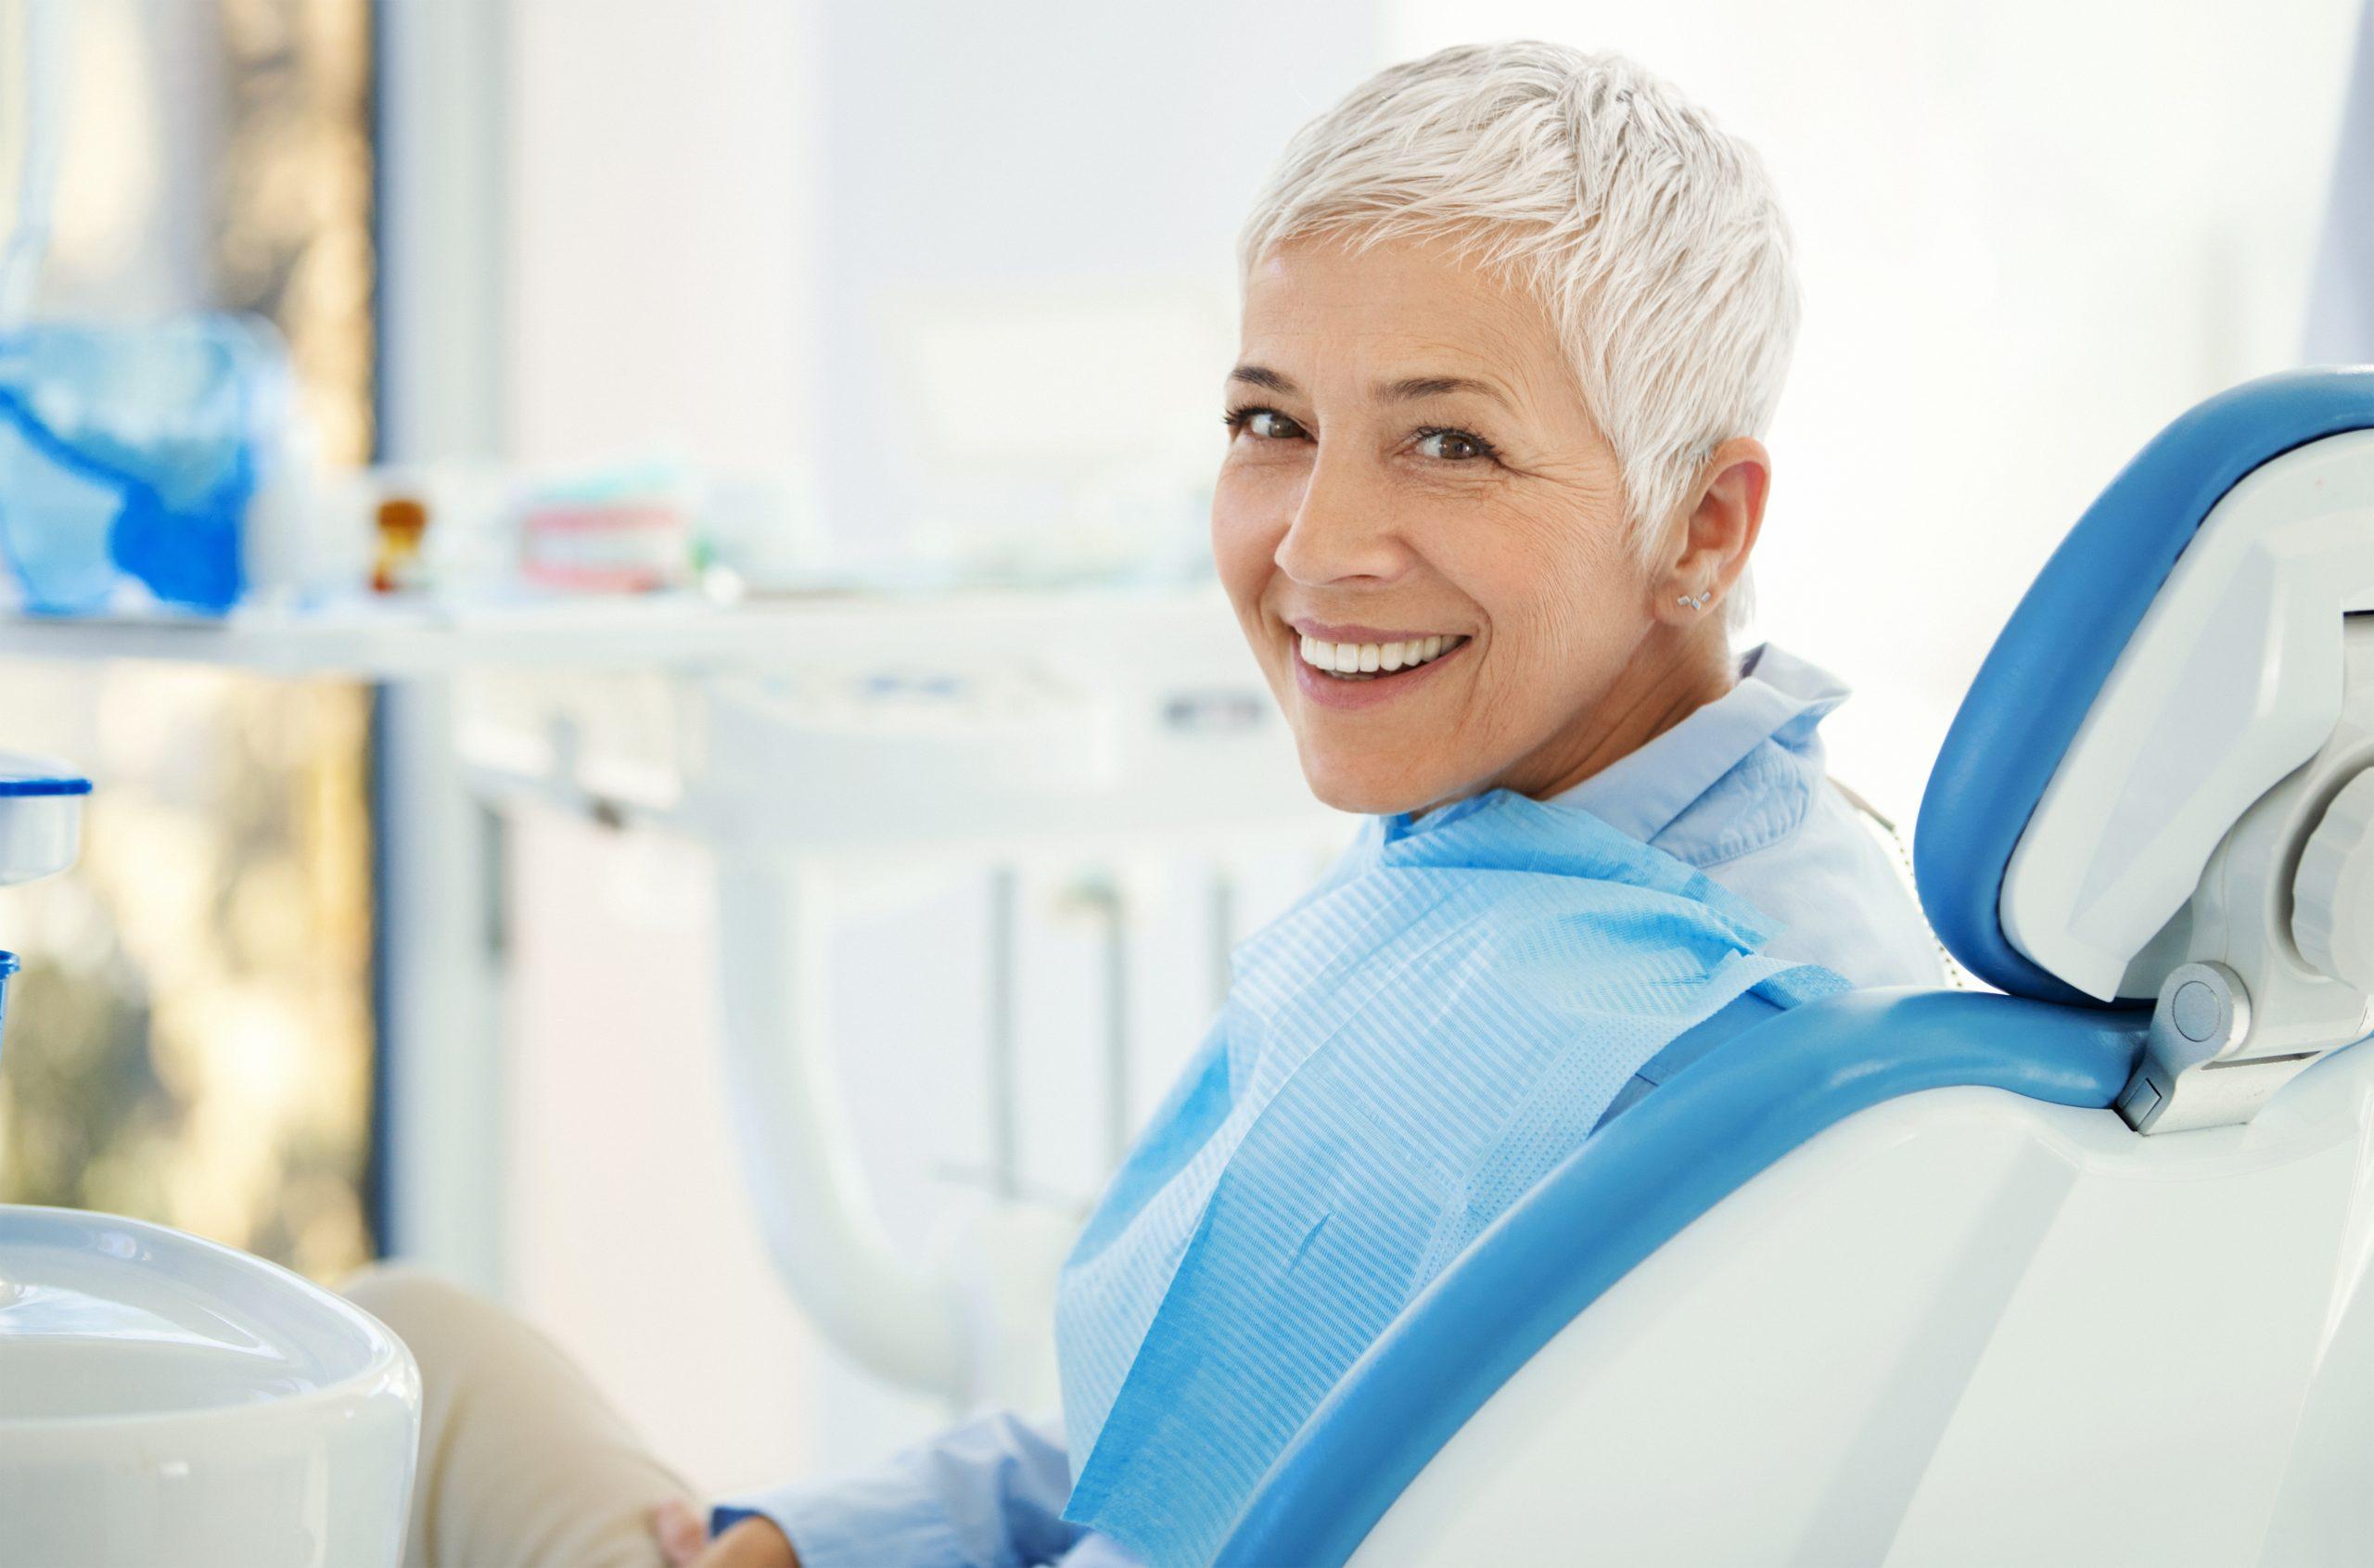 woman in dental chair getting dental restoration treatment.